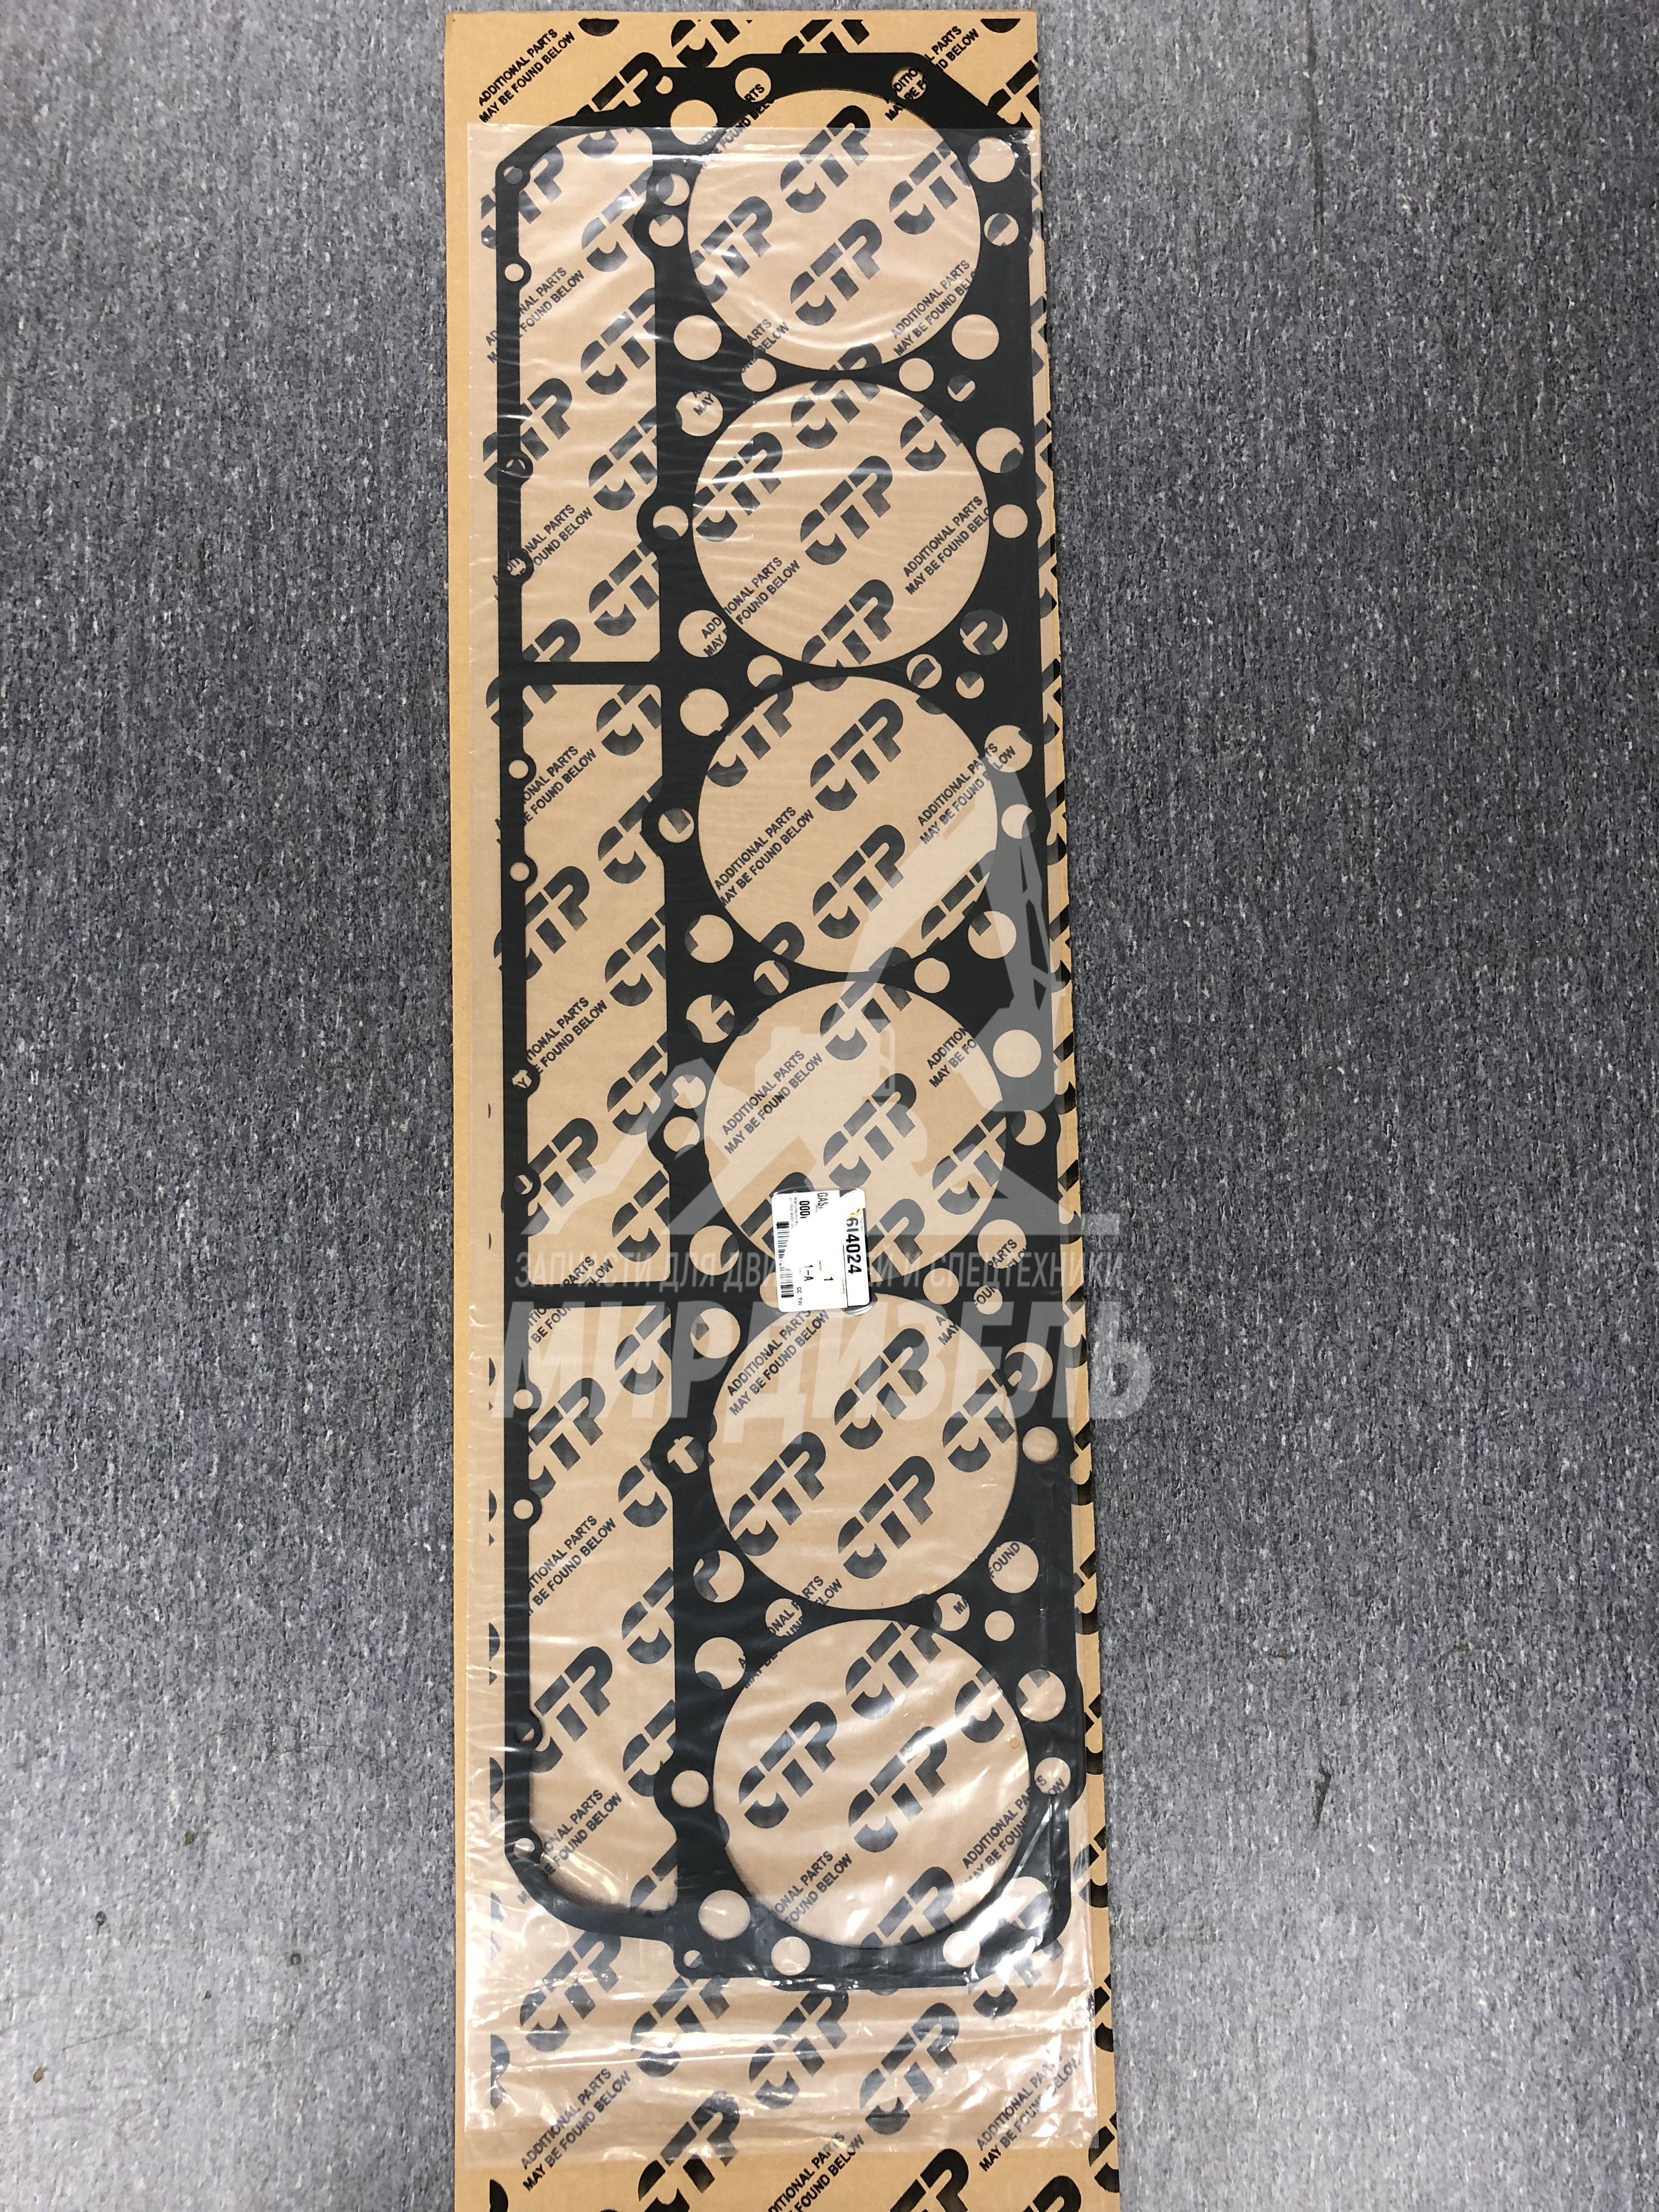 Прокладка платы ГБЦ 6I-4024 (6I4024 Caterpillar)